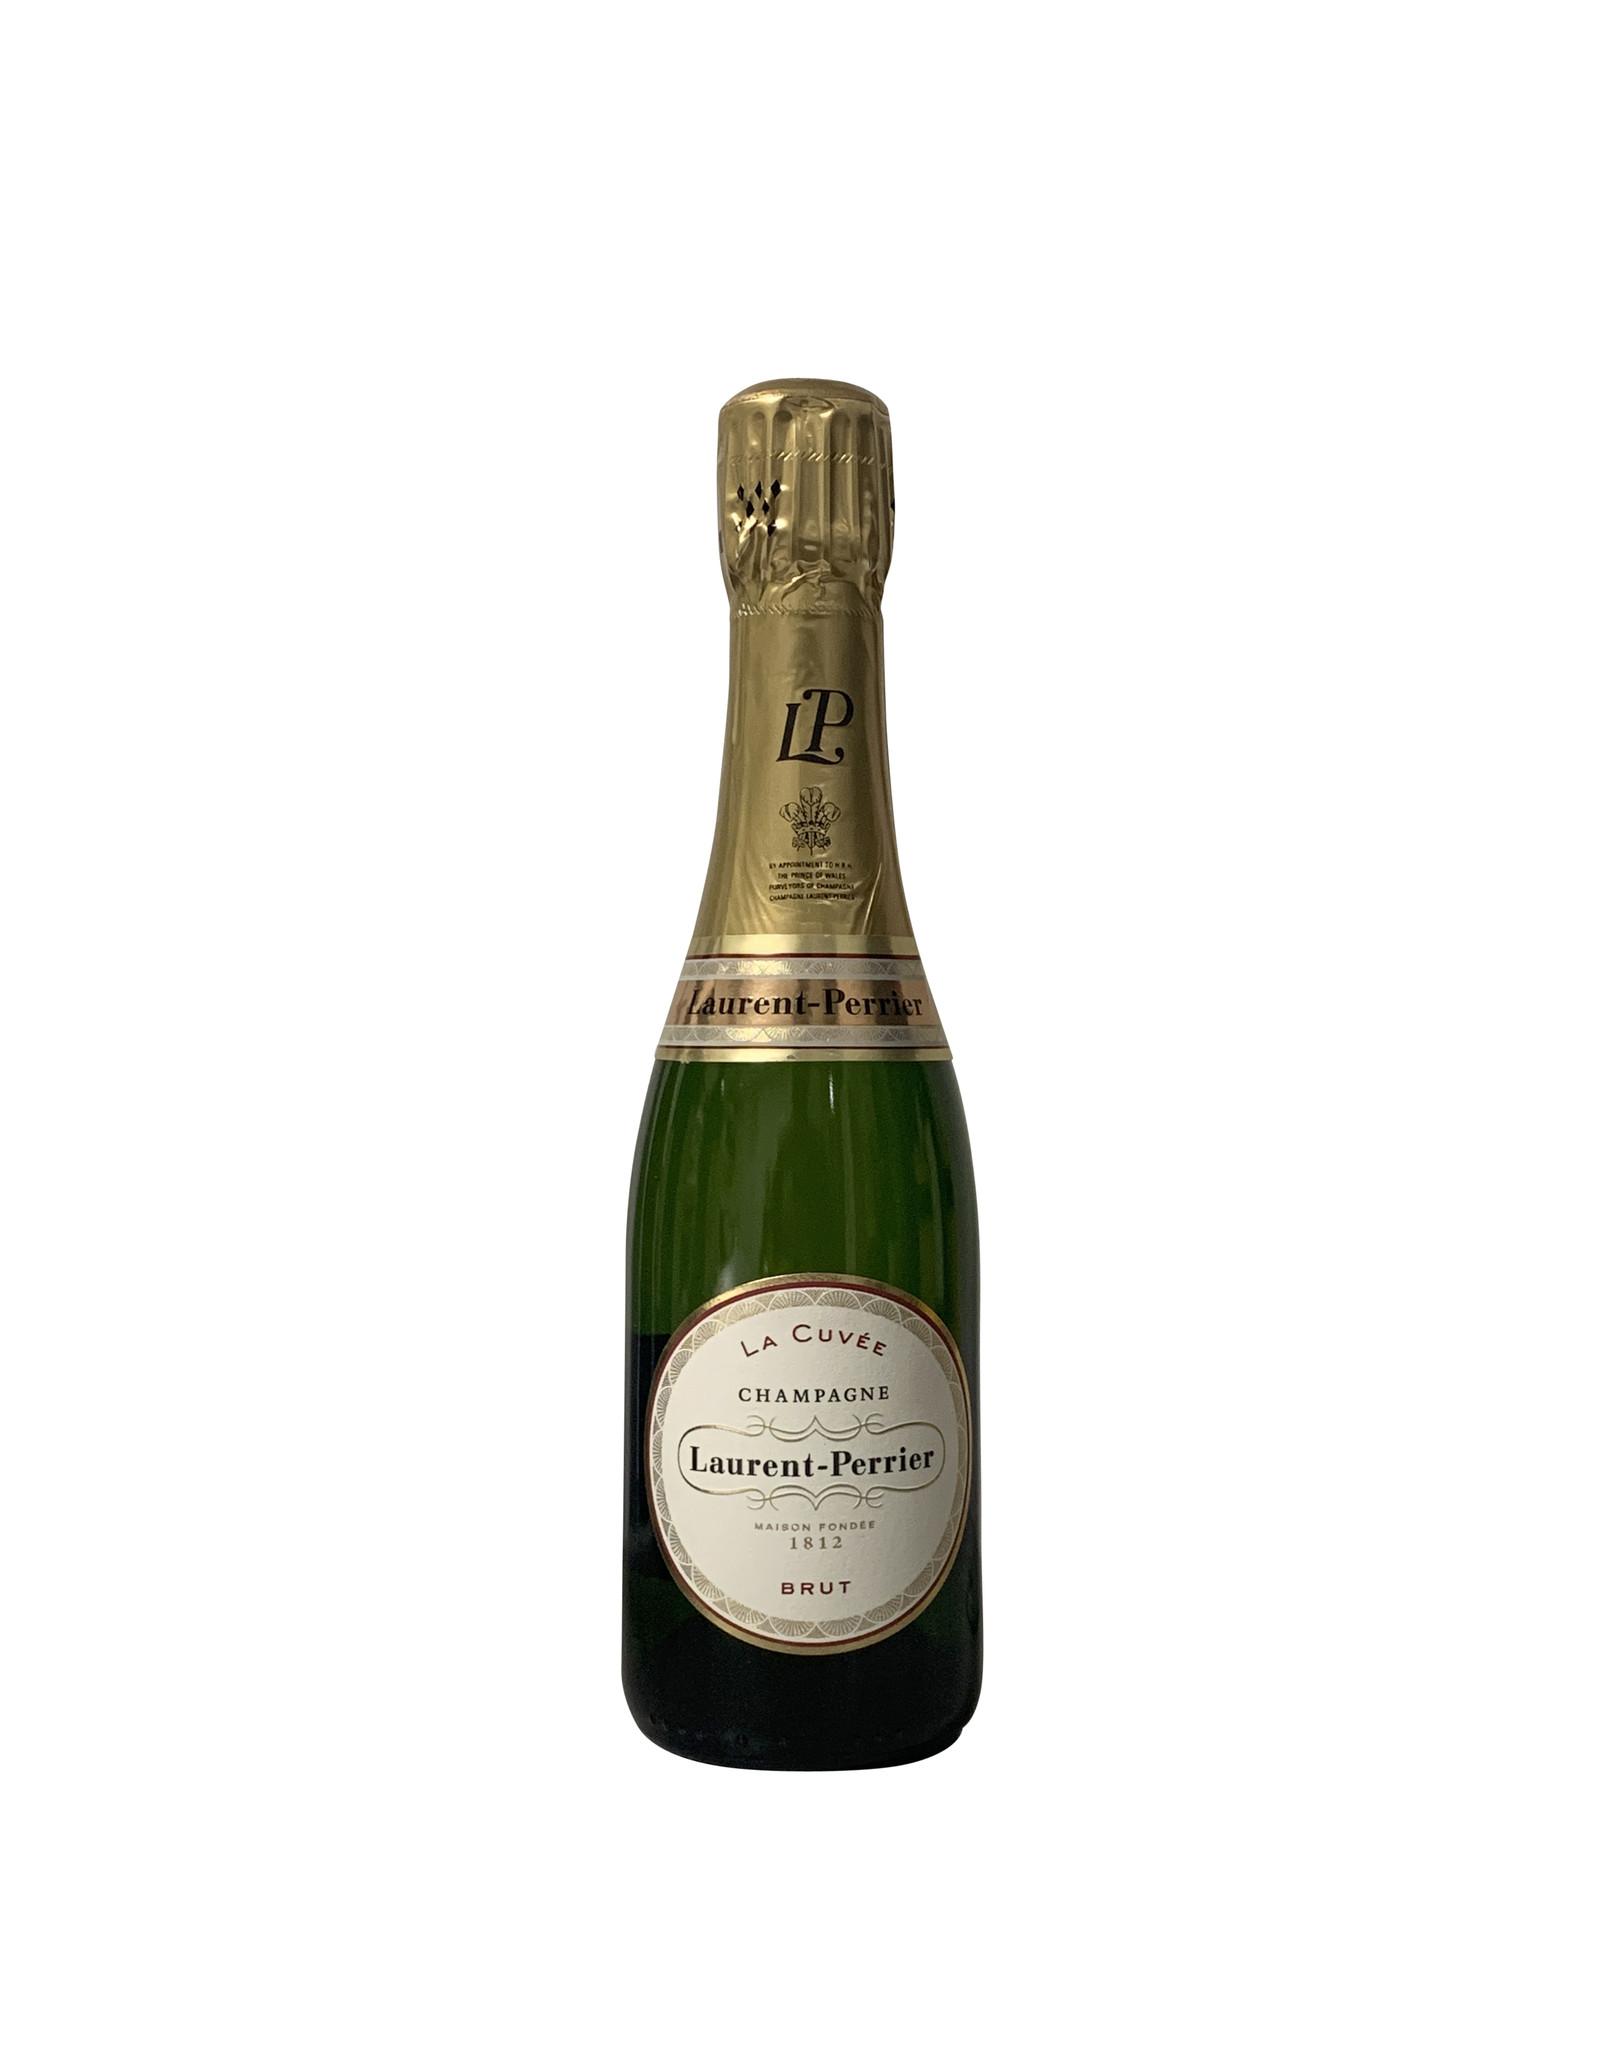 Laurent-Perrier Laurent-Perrier La Cuvee Champagne Brut NV, Champagne, France (375mL)